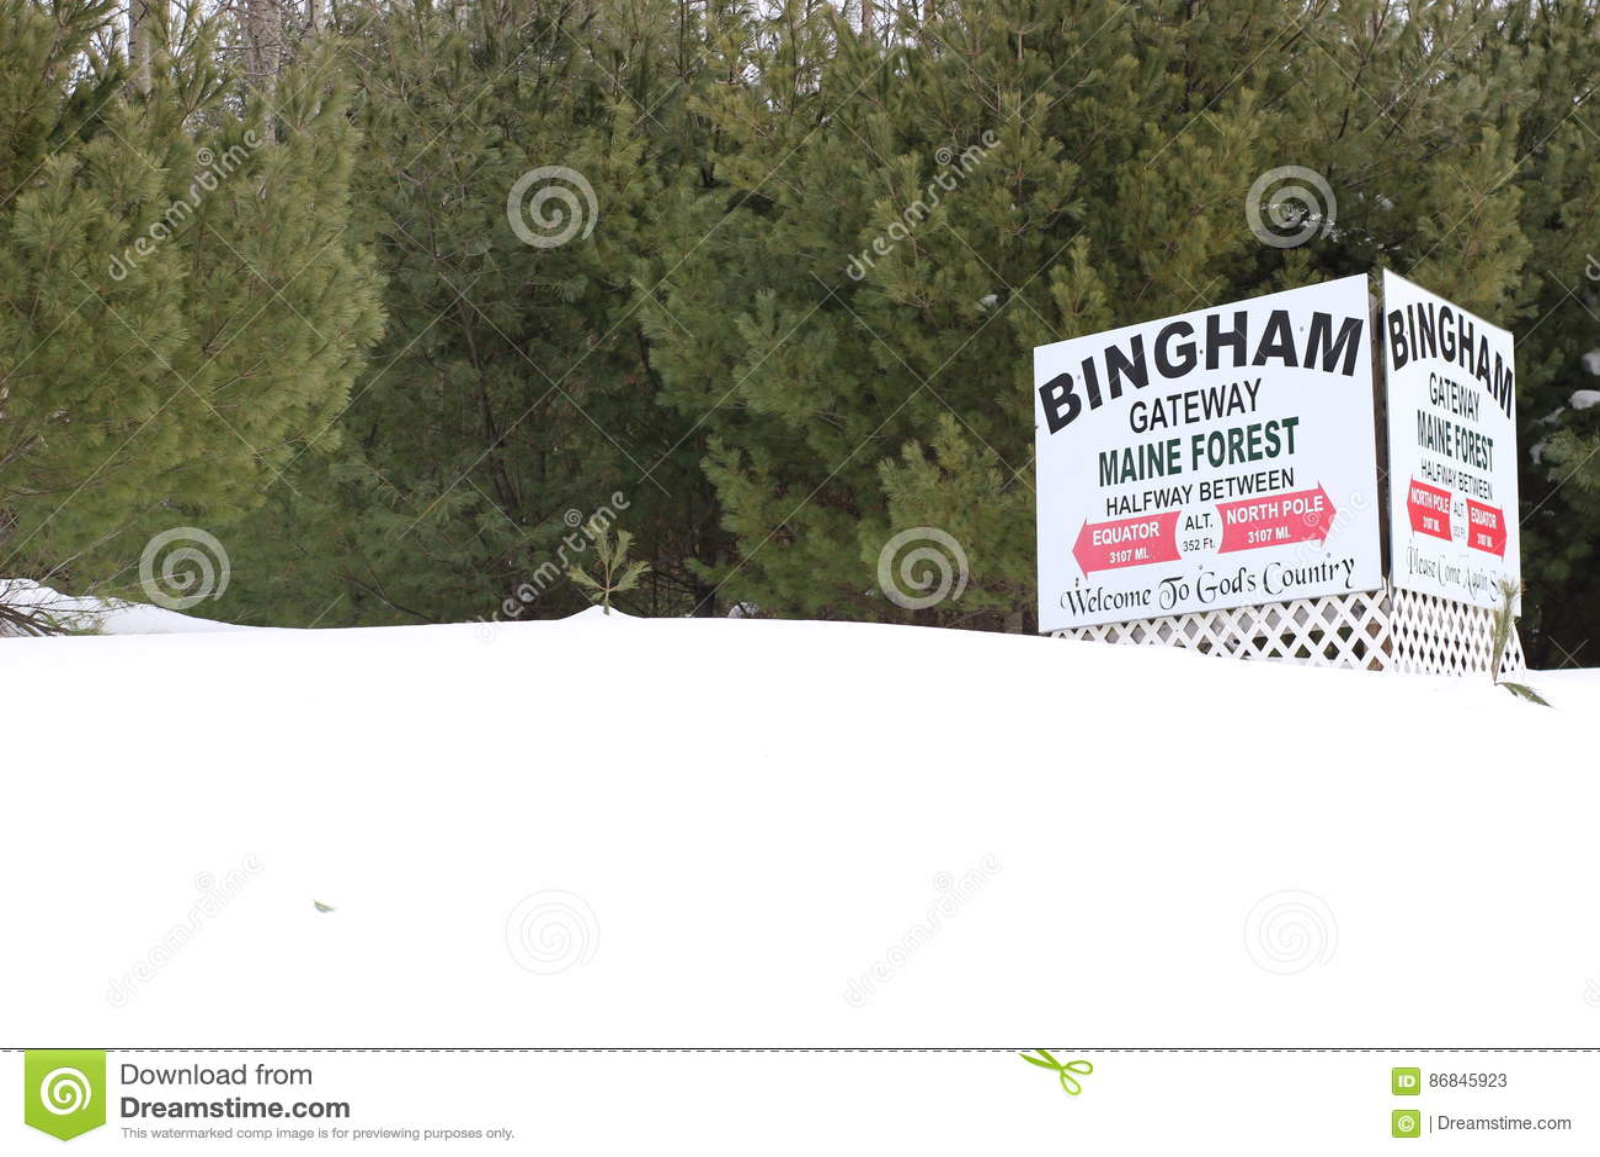 Bingham Maine